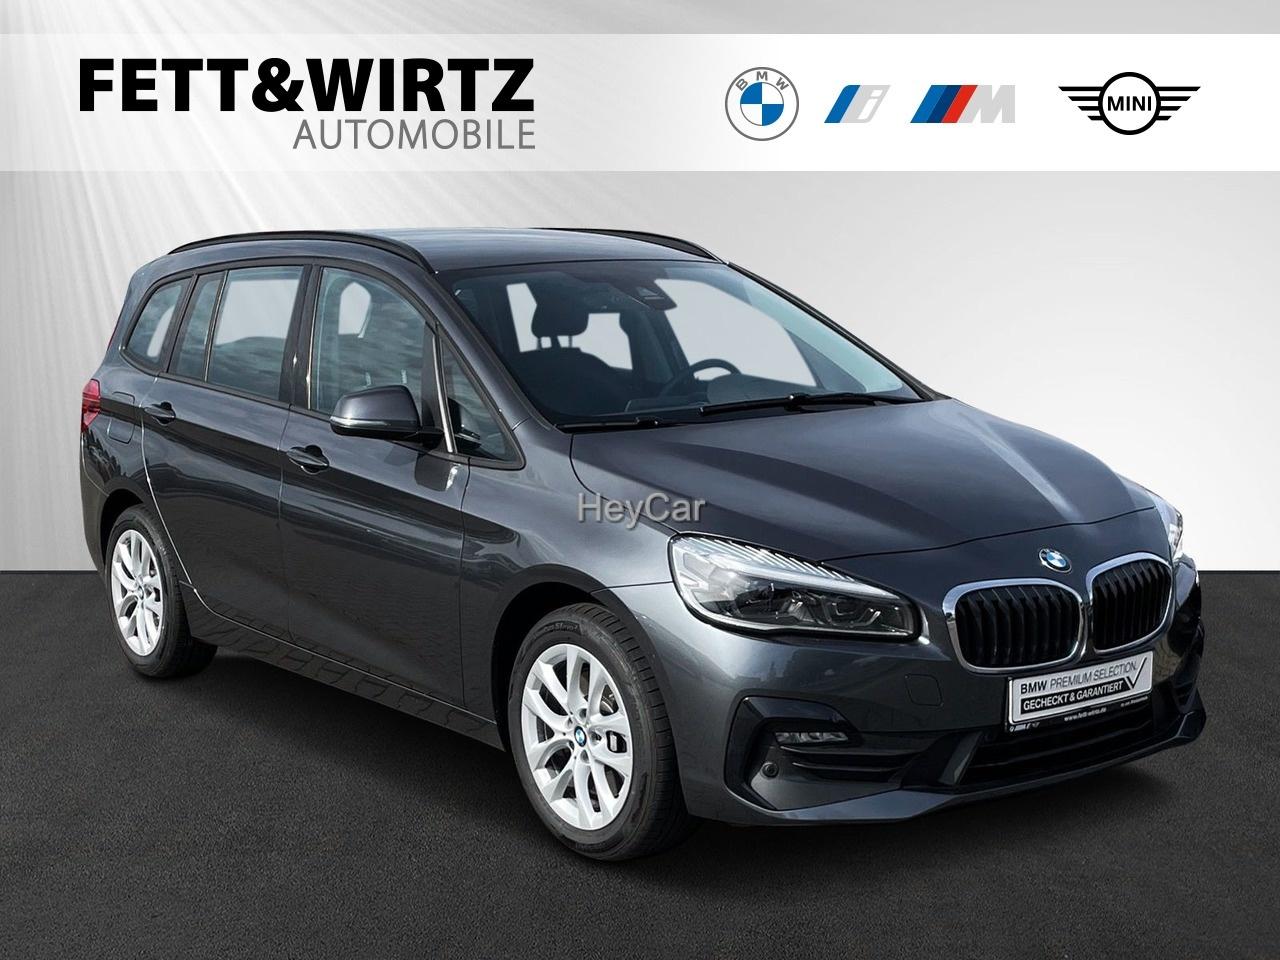 BMW 218 Gran Tourer Aut. Sports. Navi SHZ LED PA, Jahr 2020, Diesel